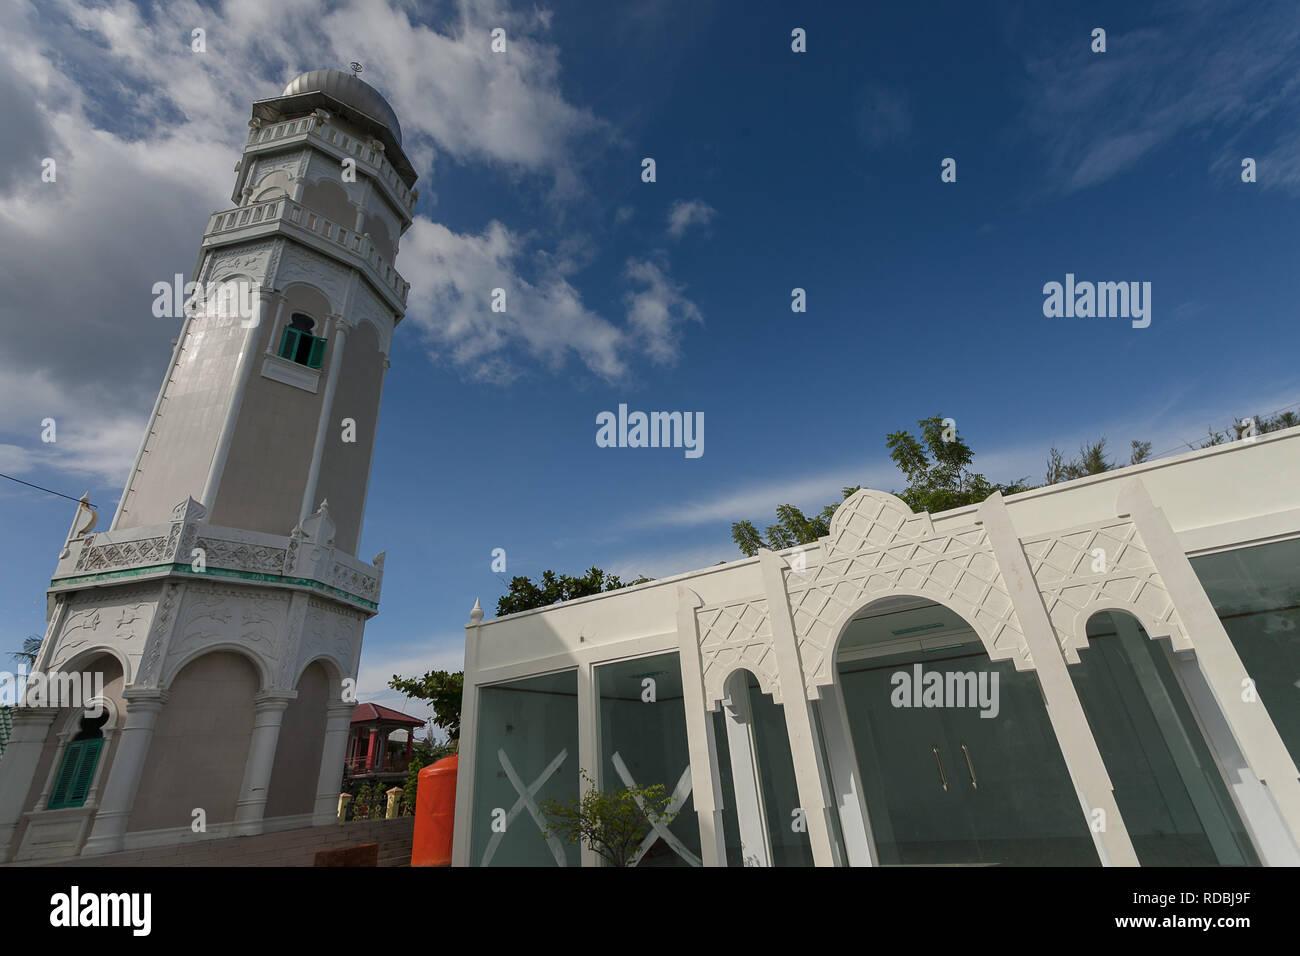 MASJID BAITURRAHIM ULEE LHEUE MEURAXA Masjid Baiturrahim, terletak di Ulee Lheue, Kecamatan Meuraxa, Banda Aceh. Masjid ini dibangun oleh Teuku Teungo Stock Photo